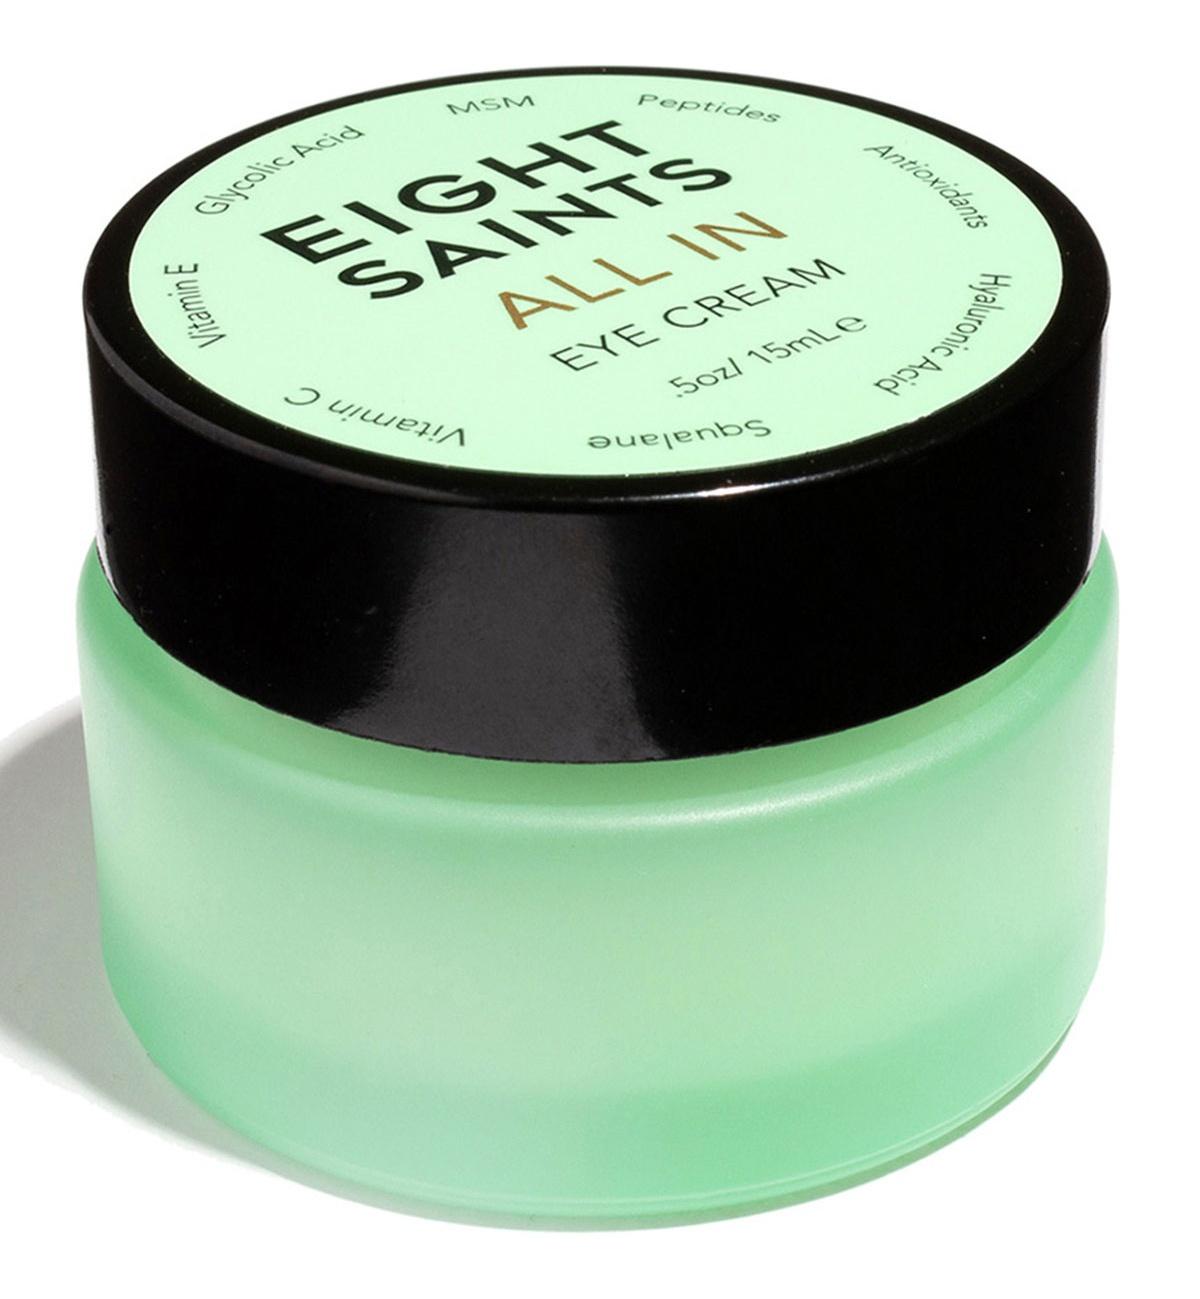 Eight Saints All-In Eye Cream